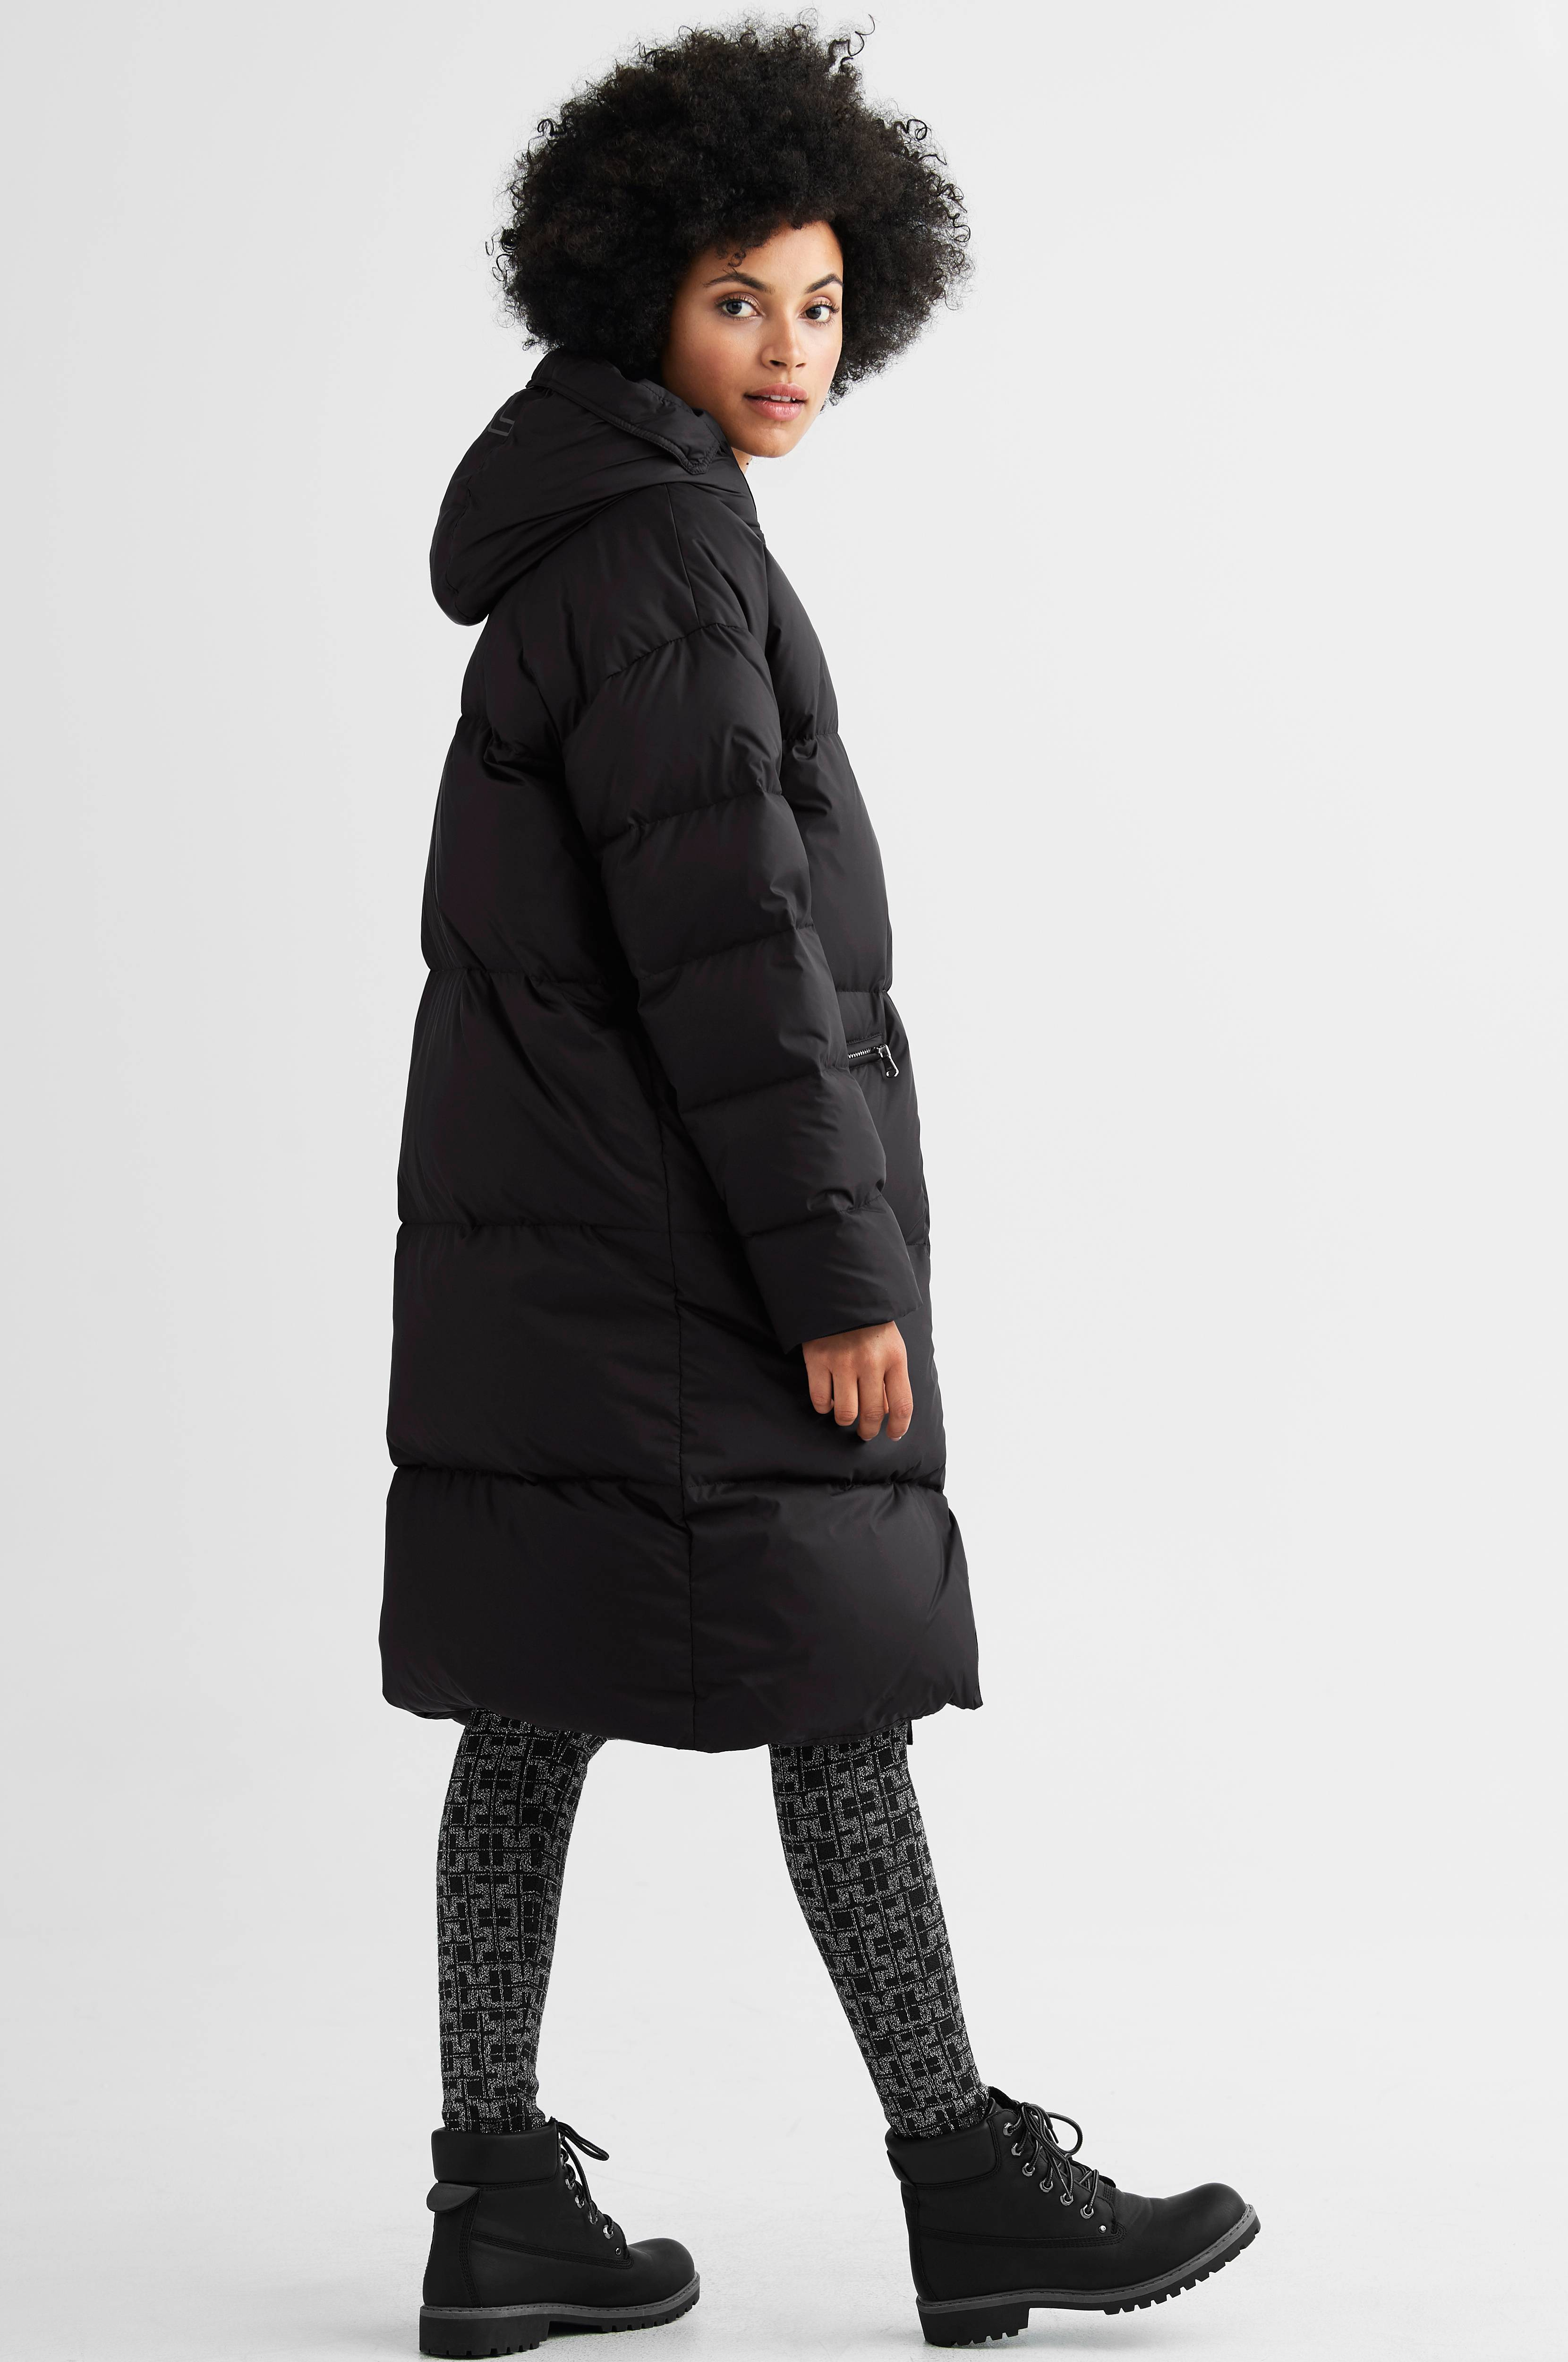 Dunkappa Sydney Taff Nylon Puffer Jacket